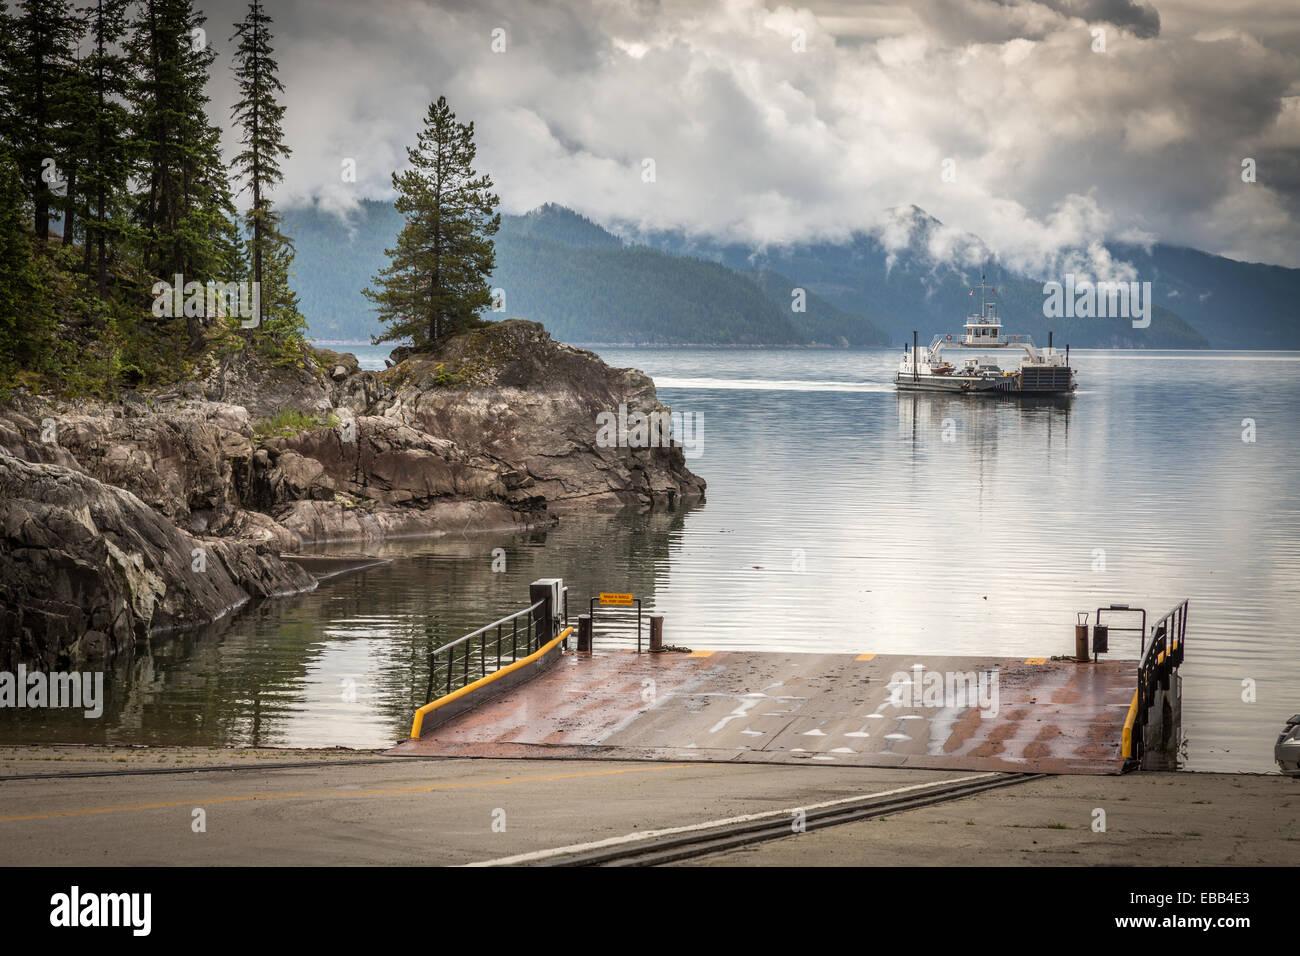 Shelter Bay, Upper Arrow Lake, British Columbia, Canada, North America. Stock Photo